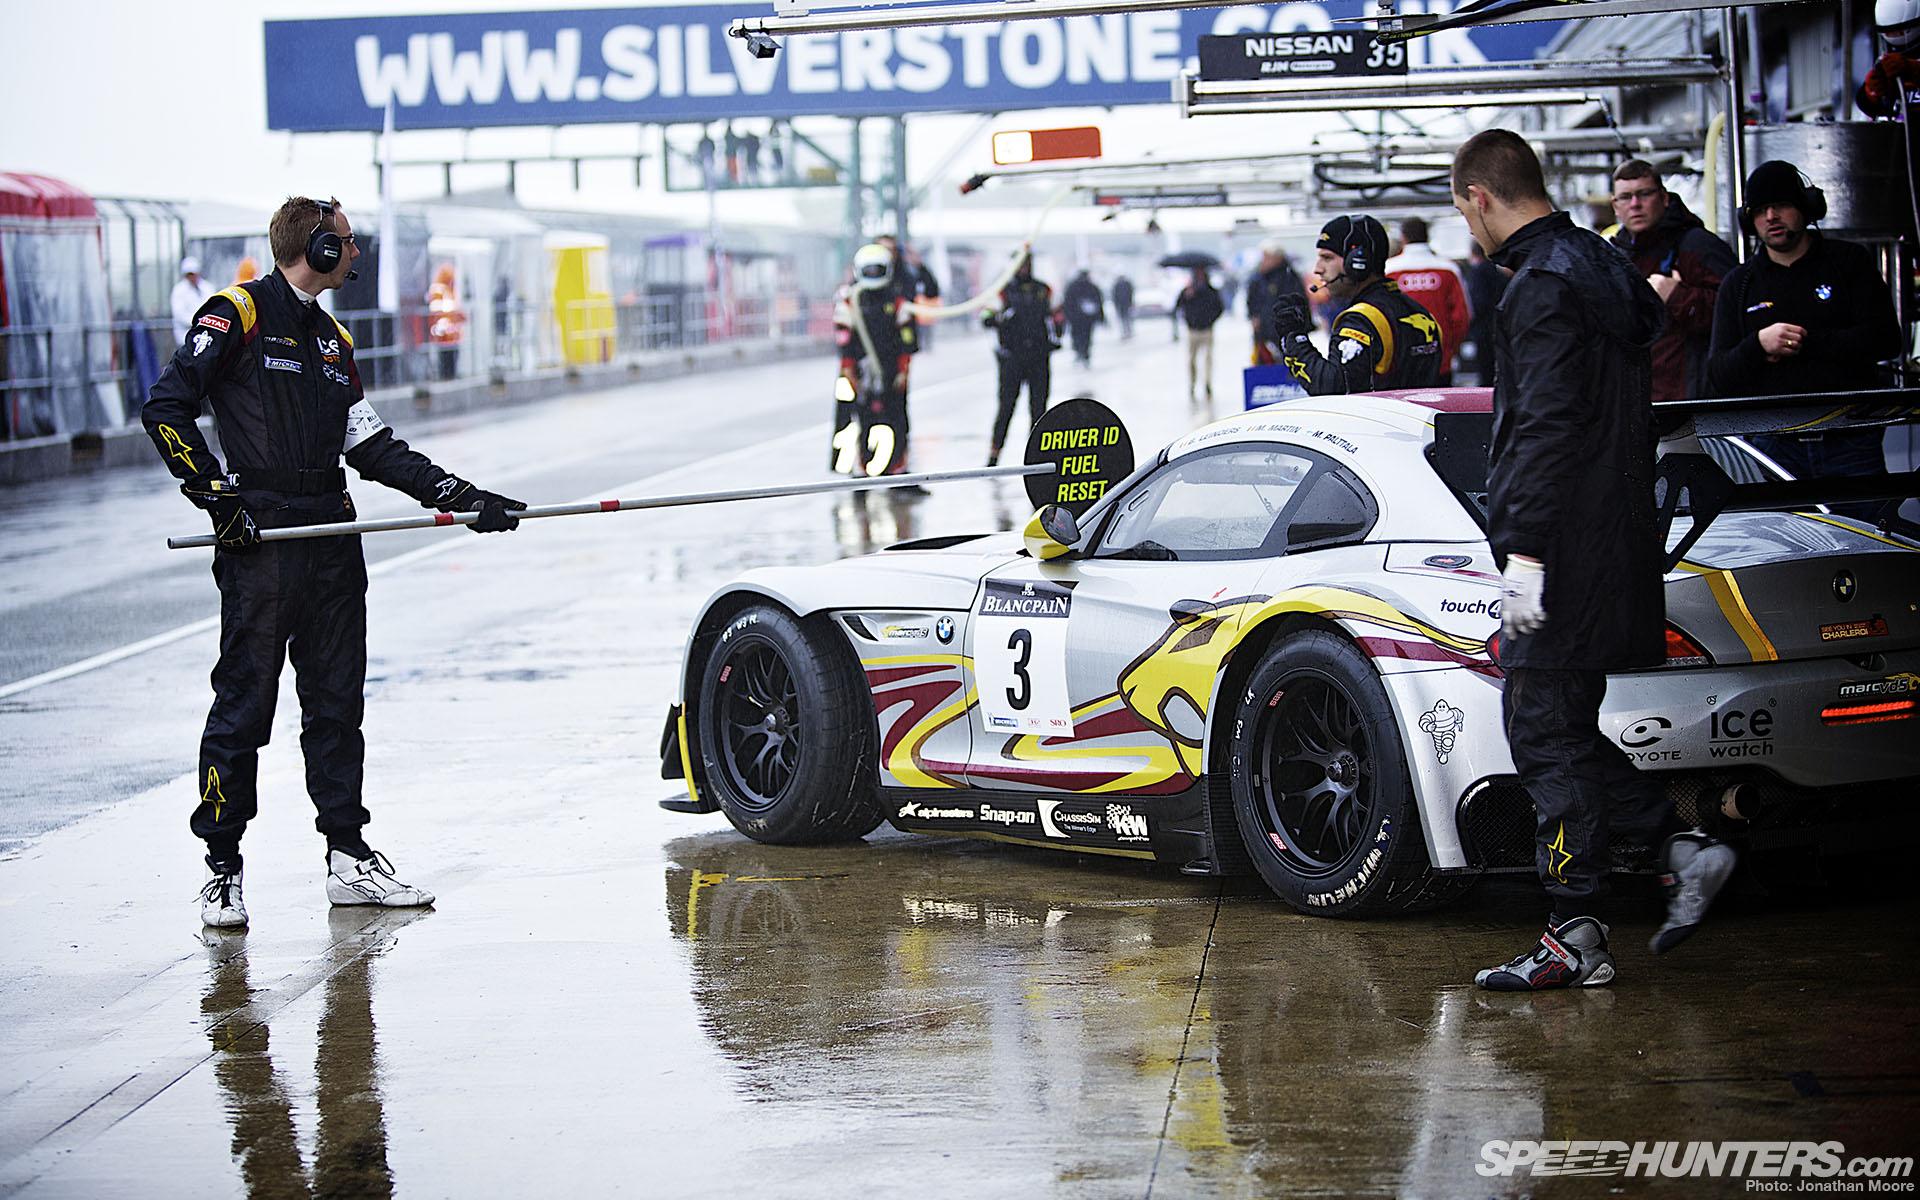 Race Car Hd Wallpaper Background Image 1920x1200 Id 255653